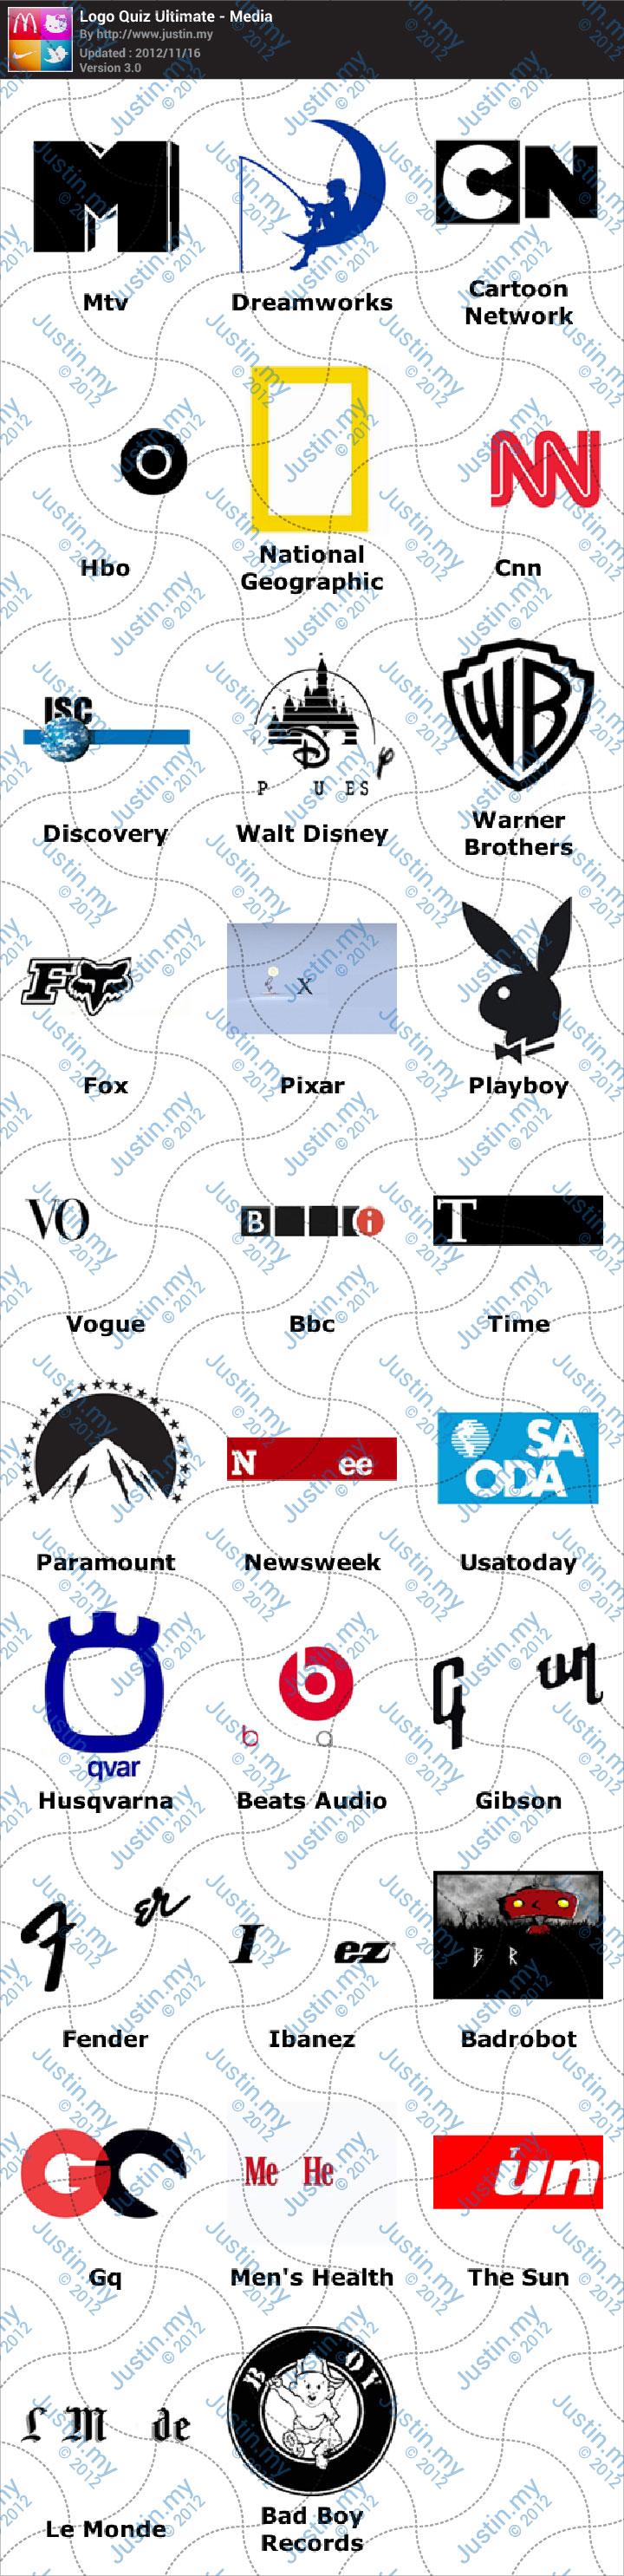 Logo Quiz Ultimate Media